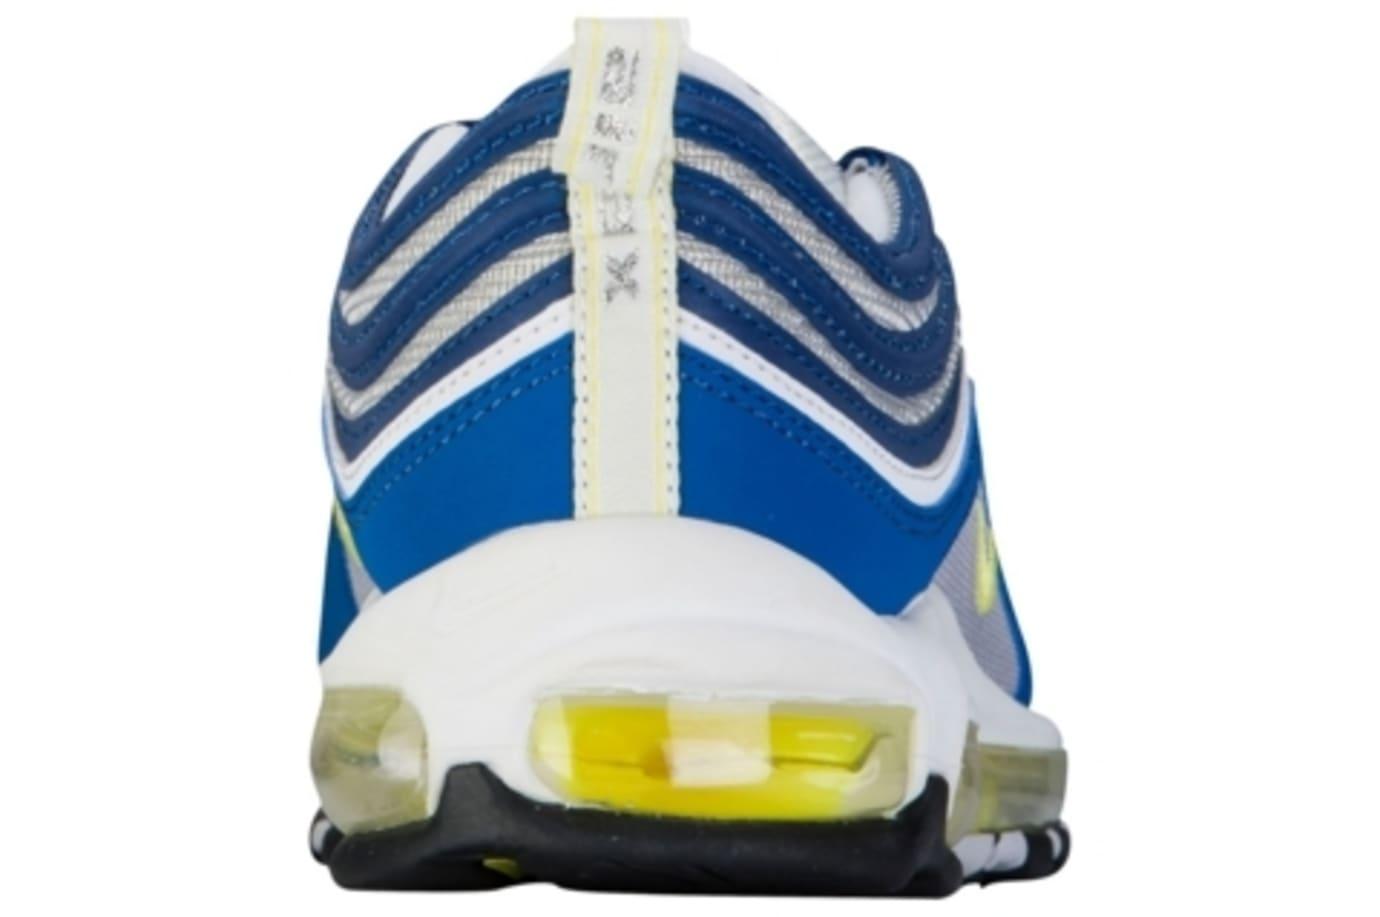 Nike Air Max 97 'Sprite' (Heel)